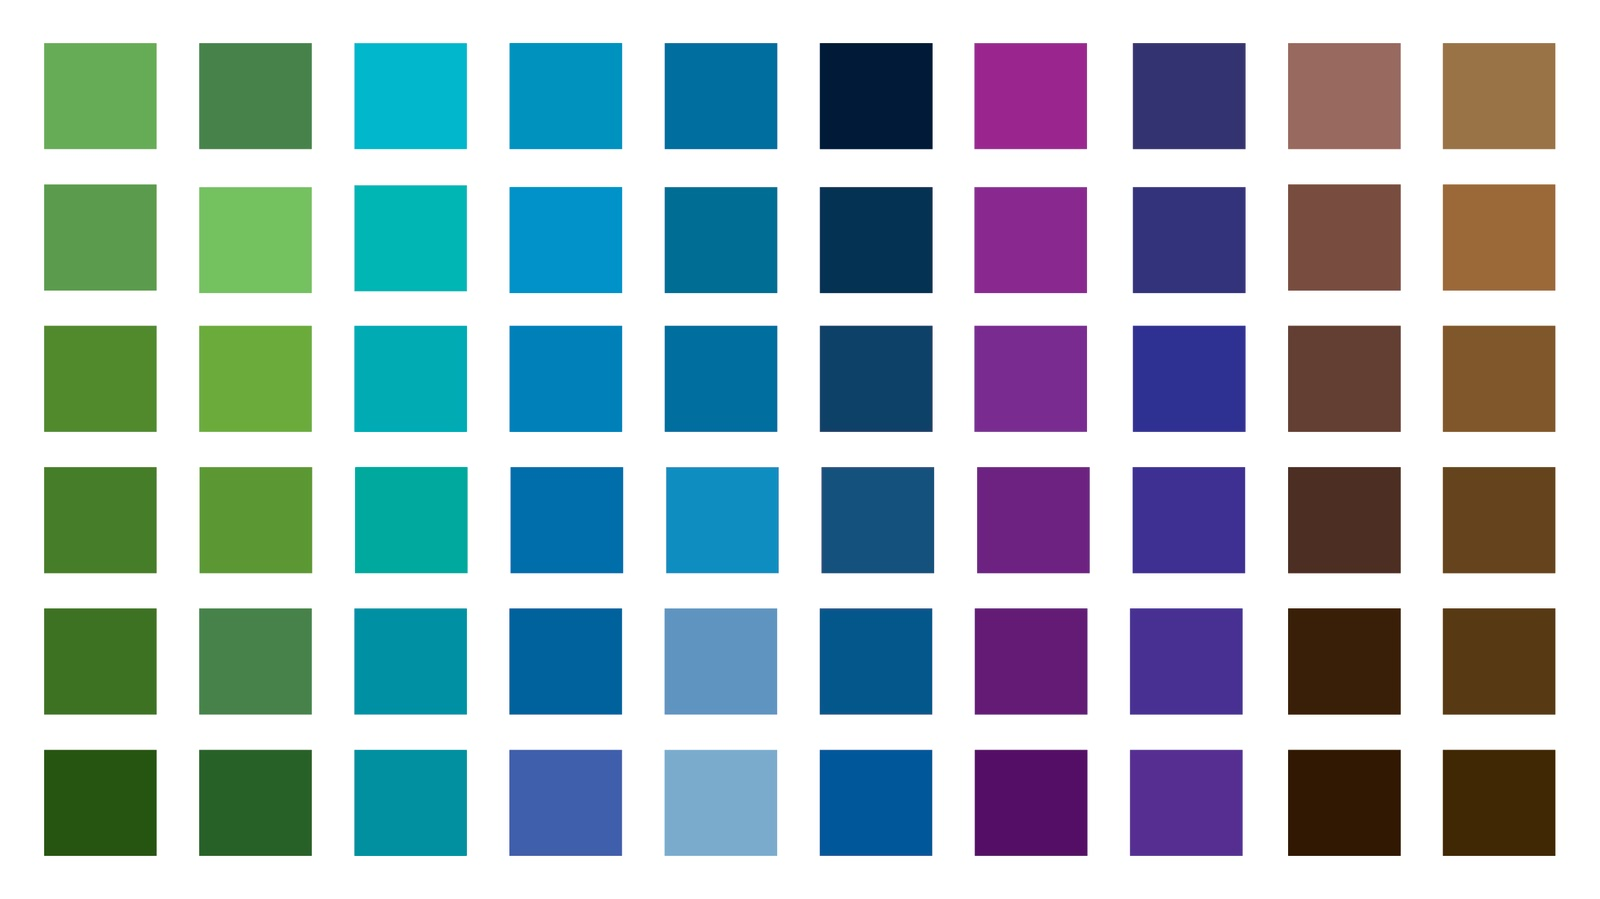 Gama Azules Gama De Azules En Stintino With Gama Azules Gallery Of - Gama-de-azul